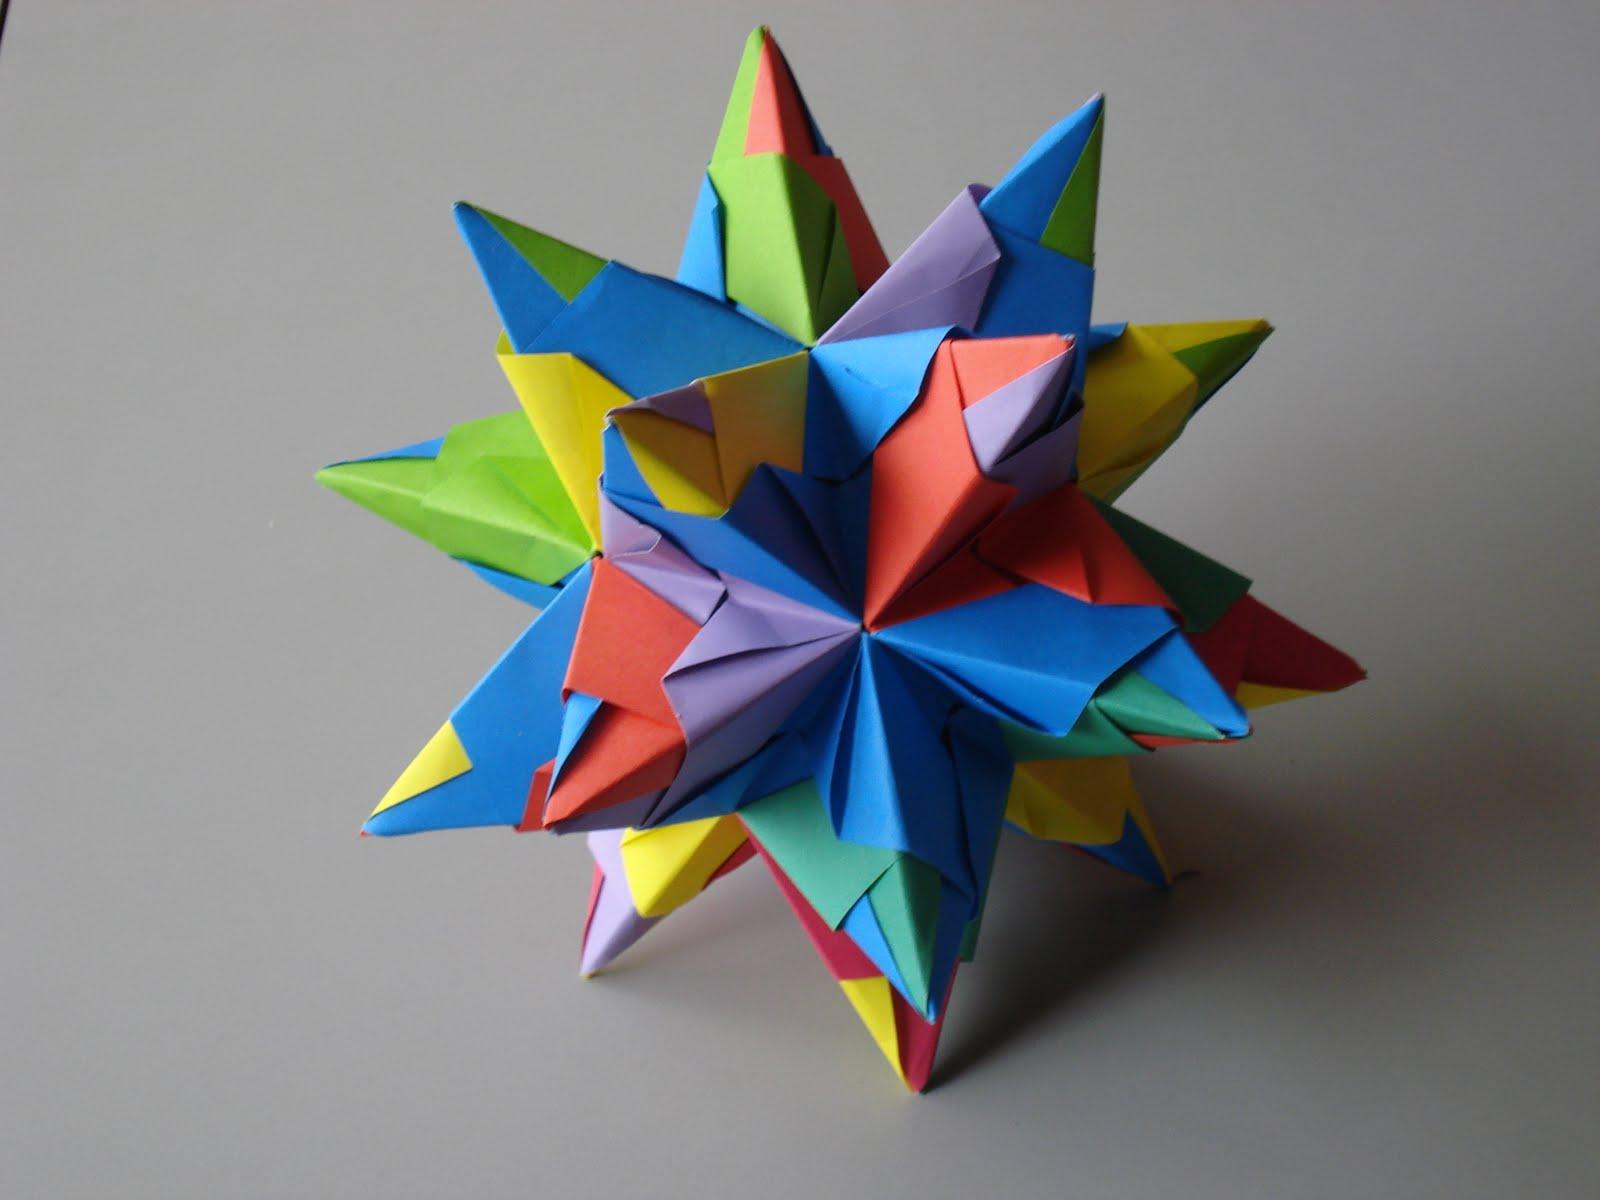 Origamijwm - Origami de una estrella ...